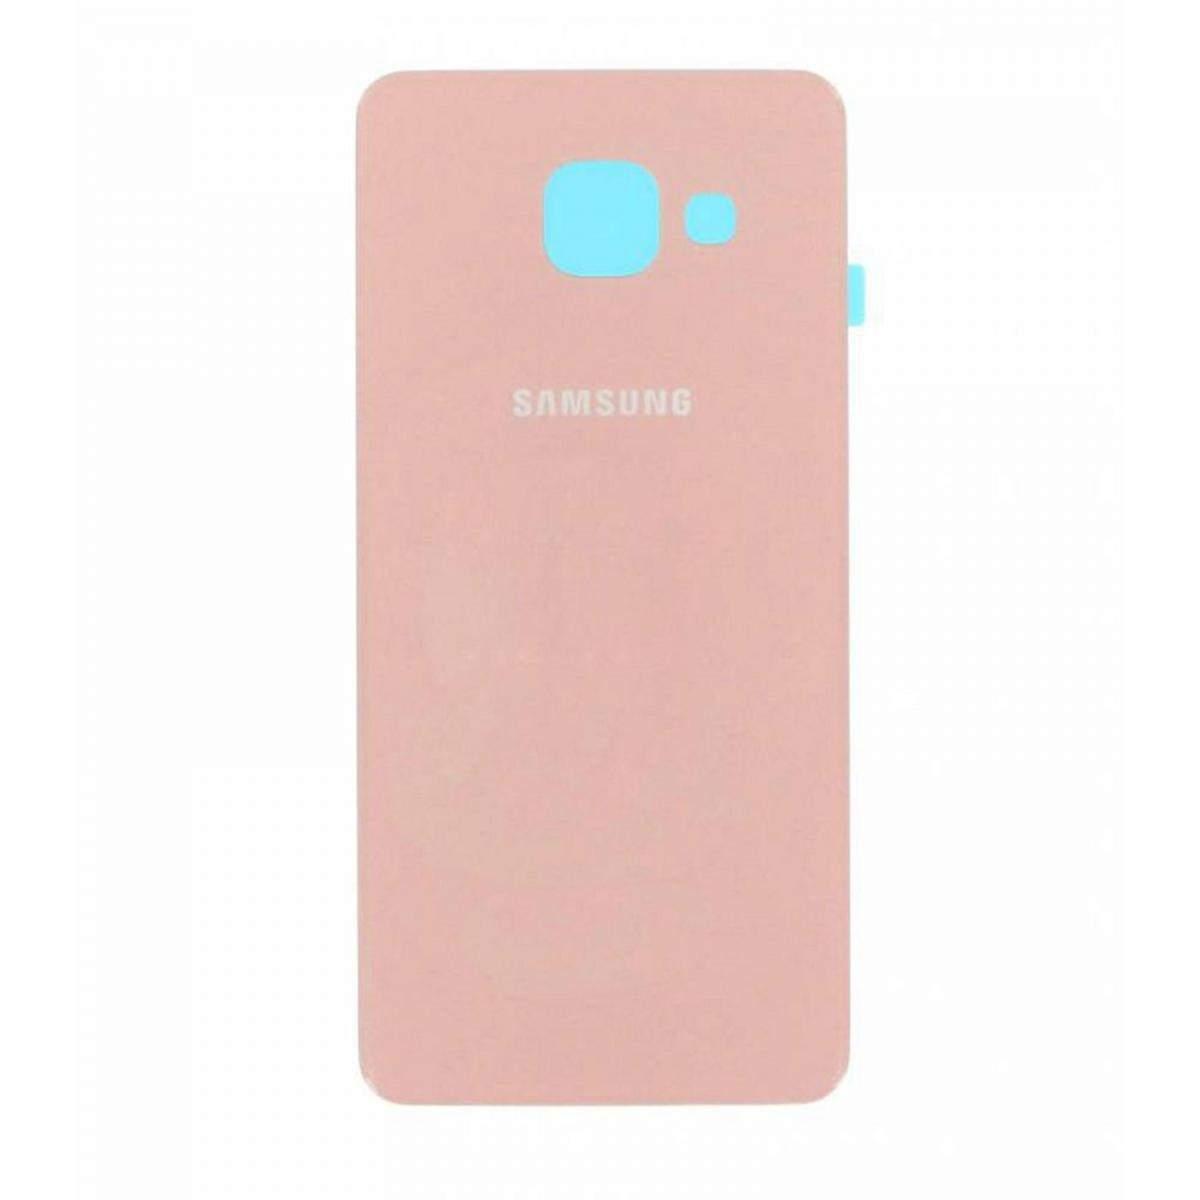 d4c2b67dfd9 Tapa de bateria cristal trasero para Samsung Galaxy A5 2016 510F Rosa